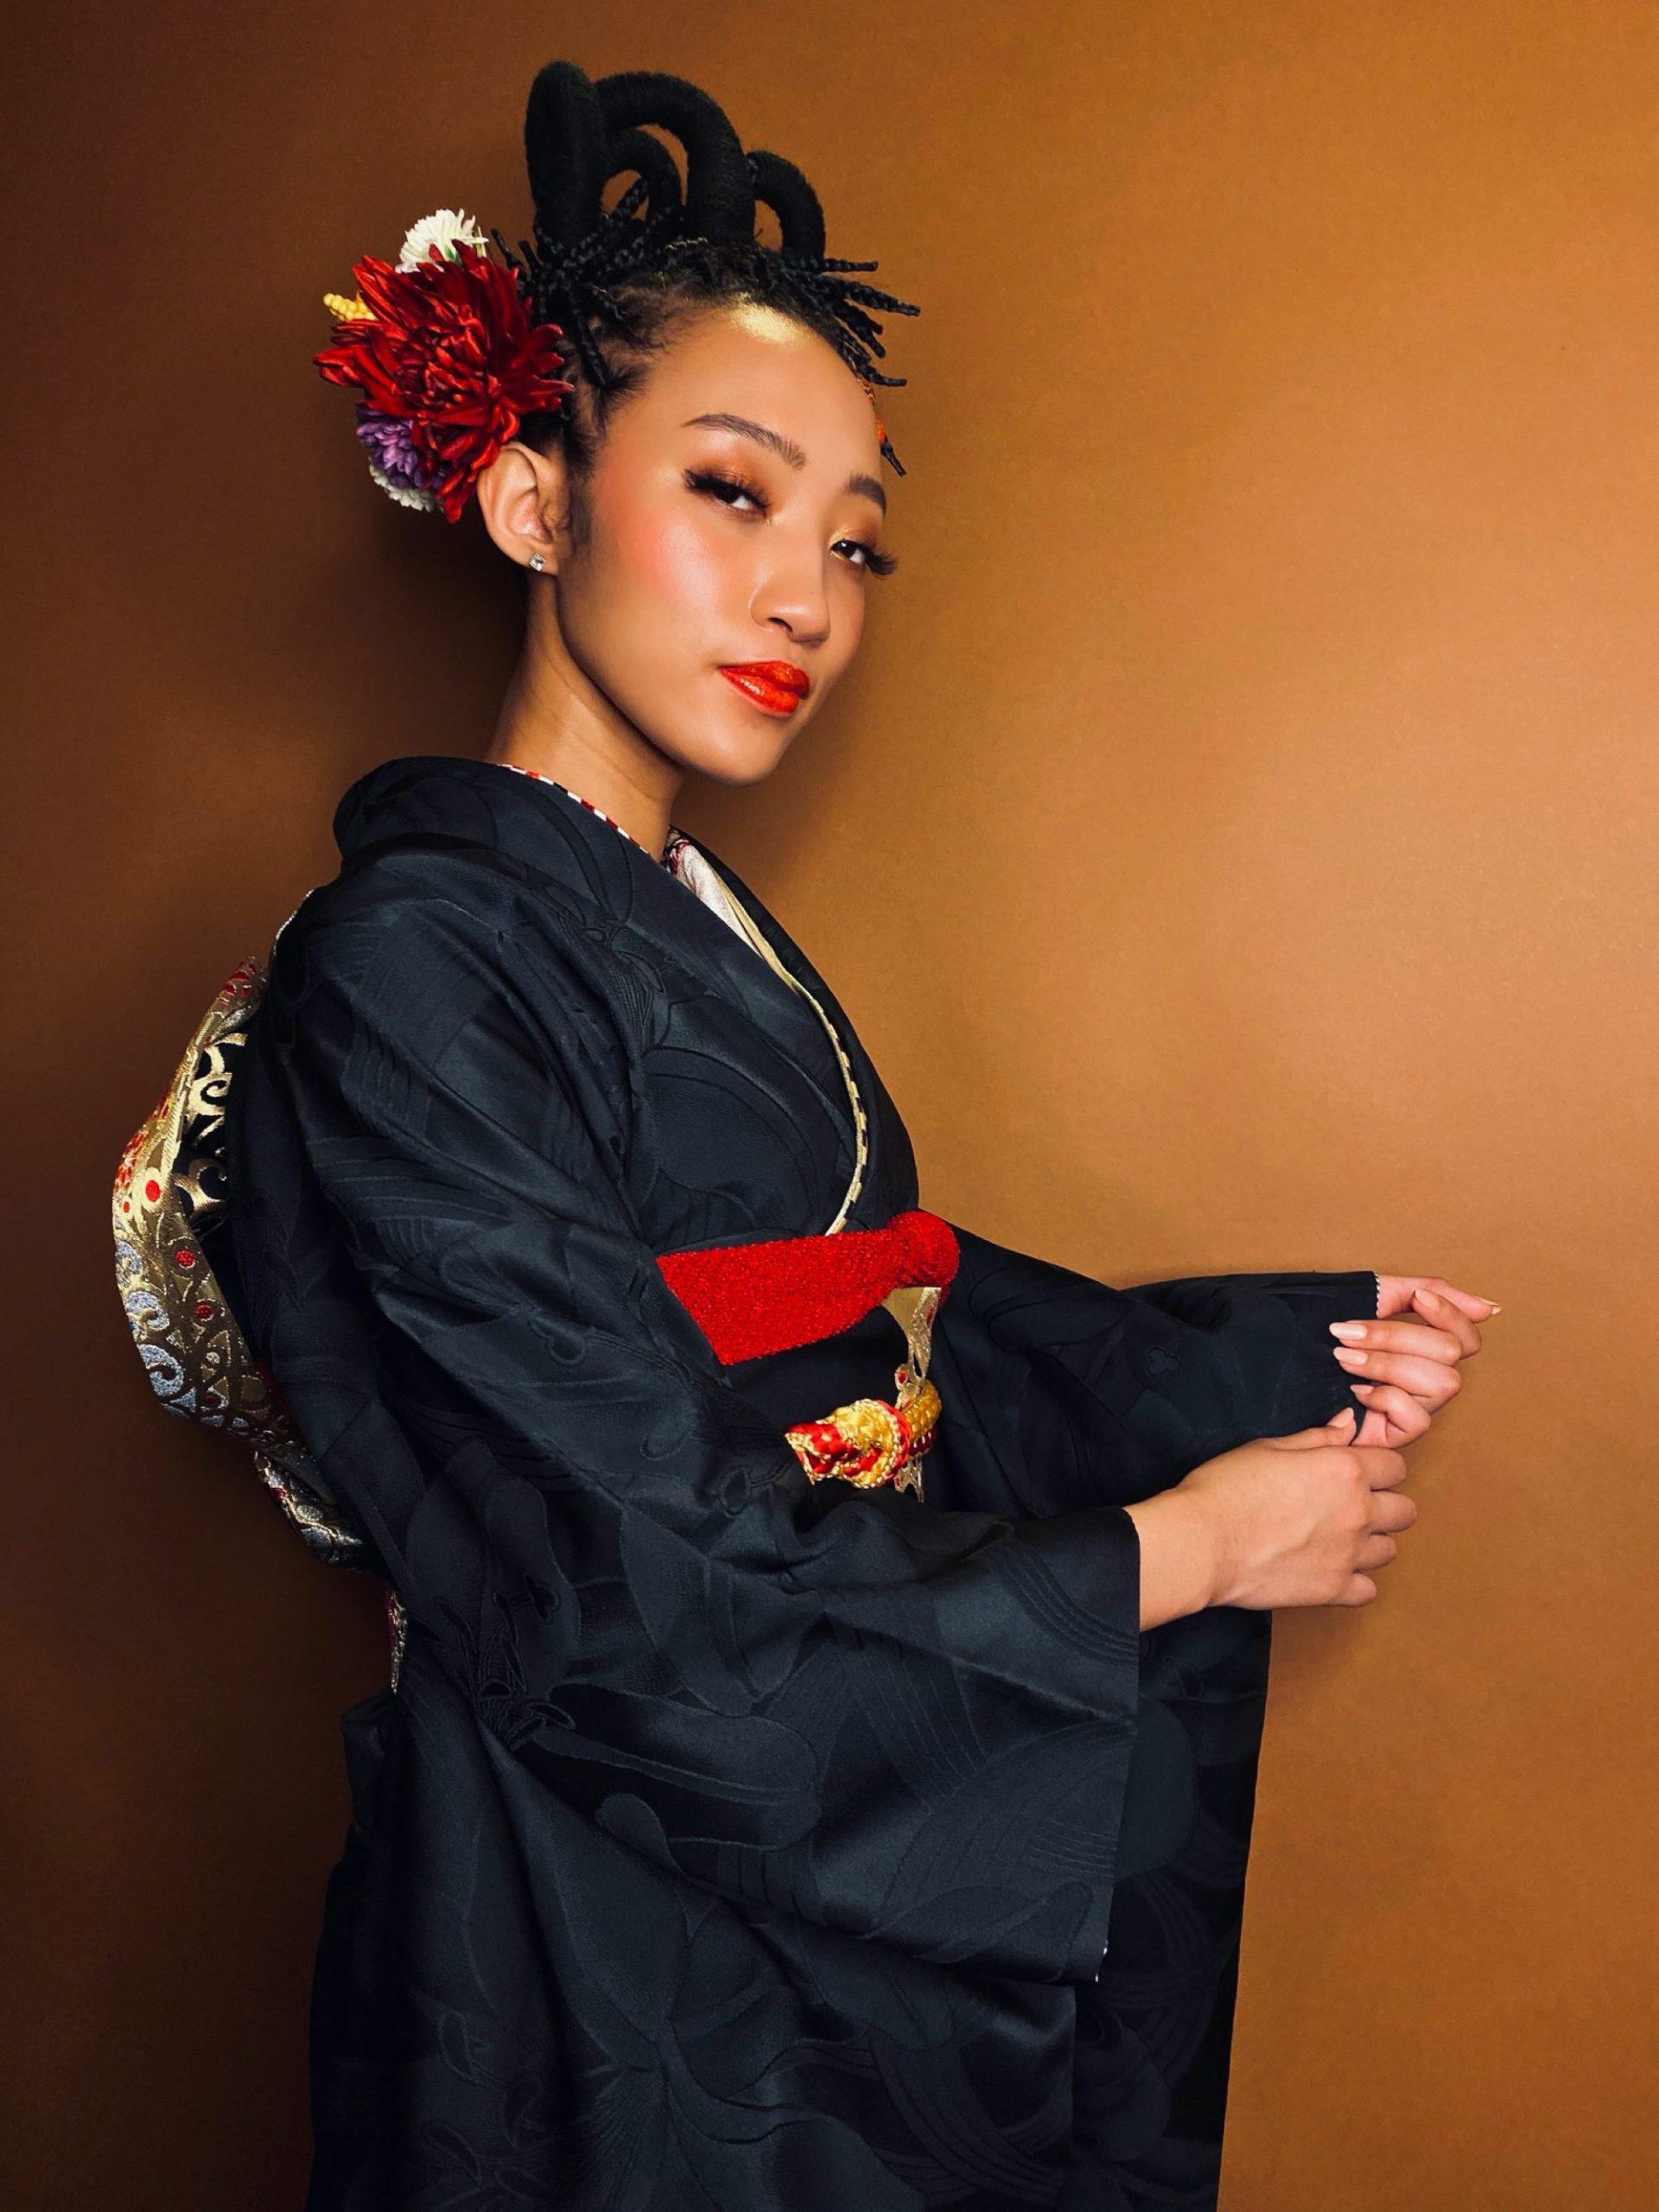 A Black model in kimono wearing braids